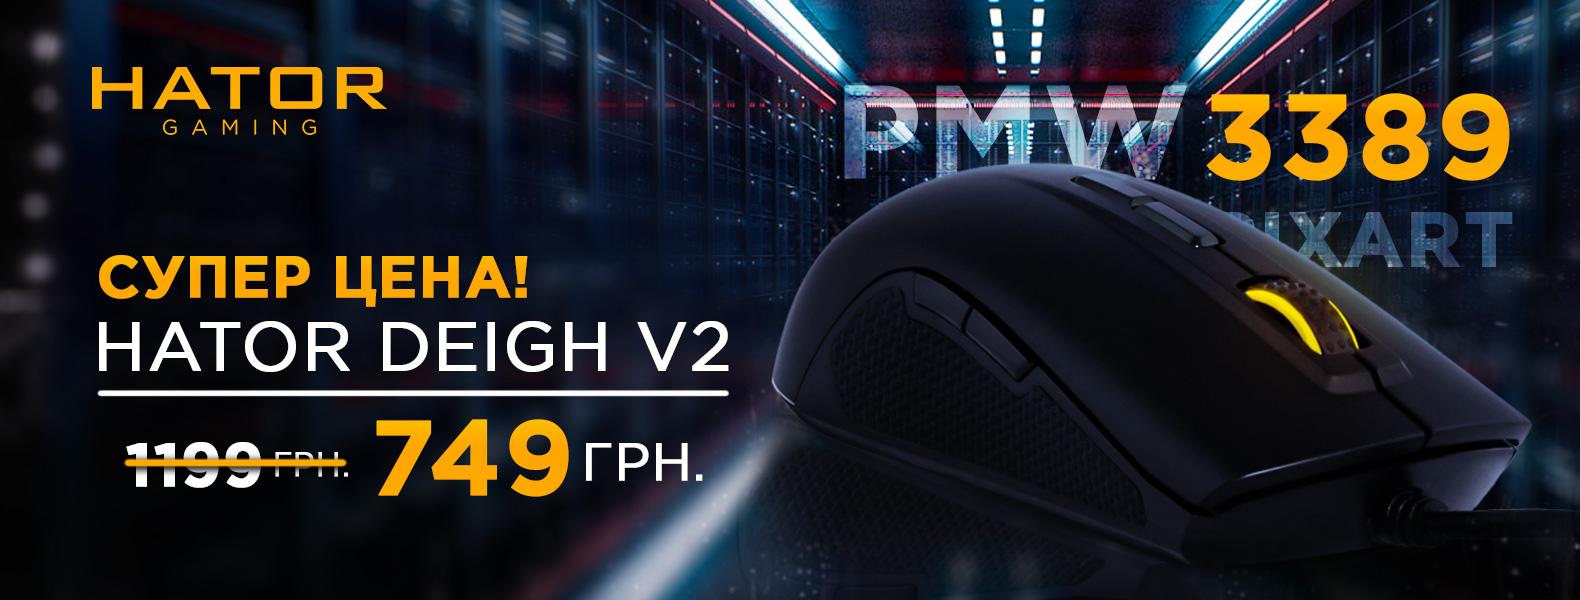 Супер цена на игровую мышь Hator Deigh V2